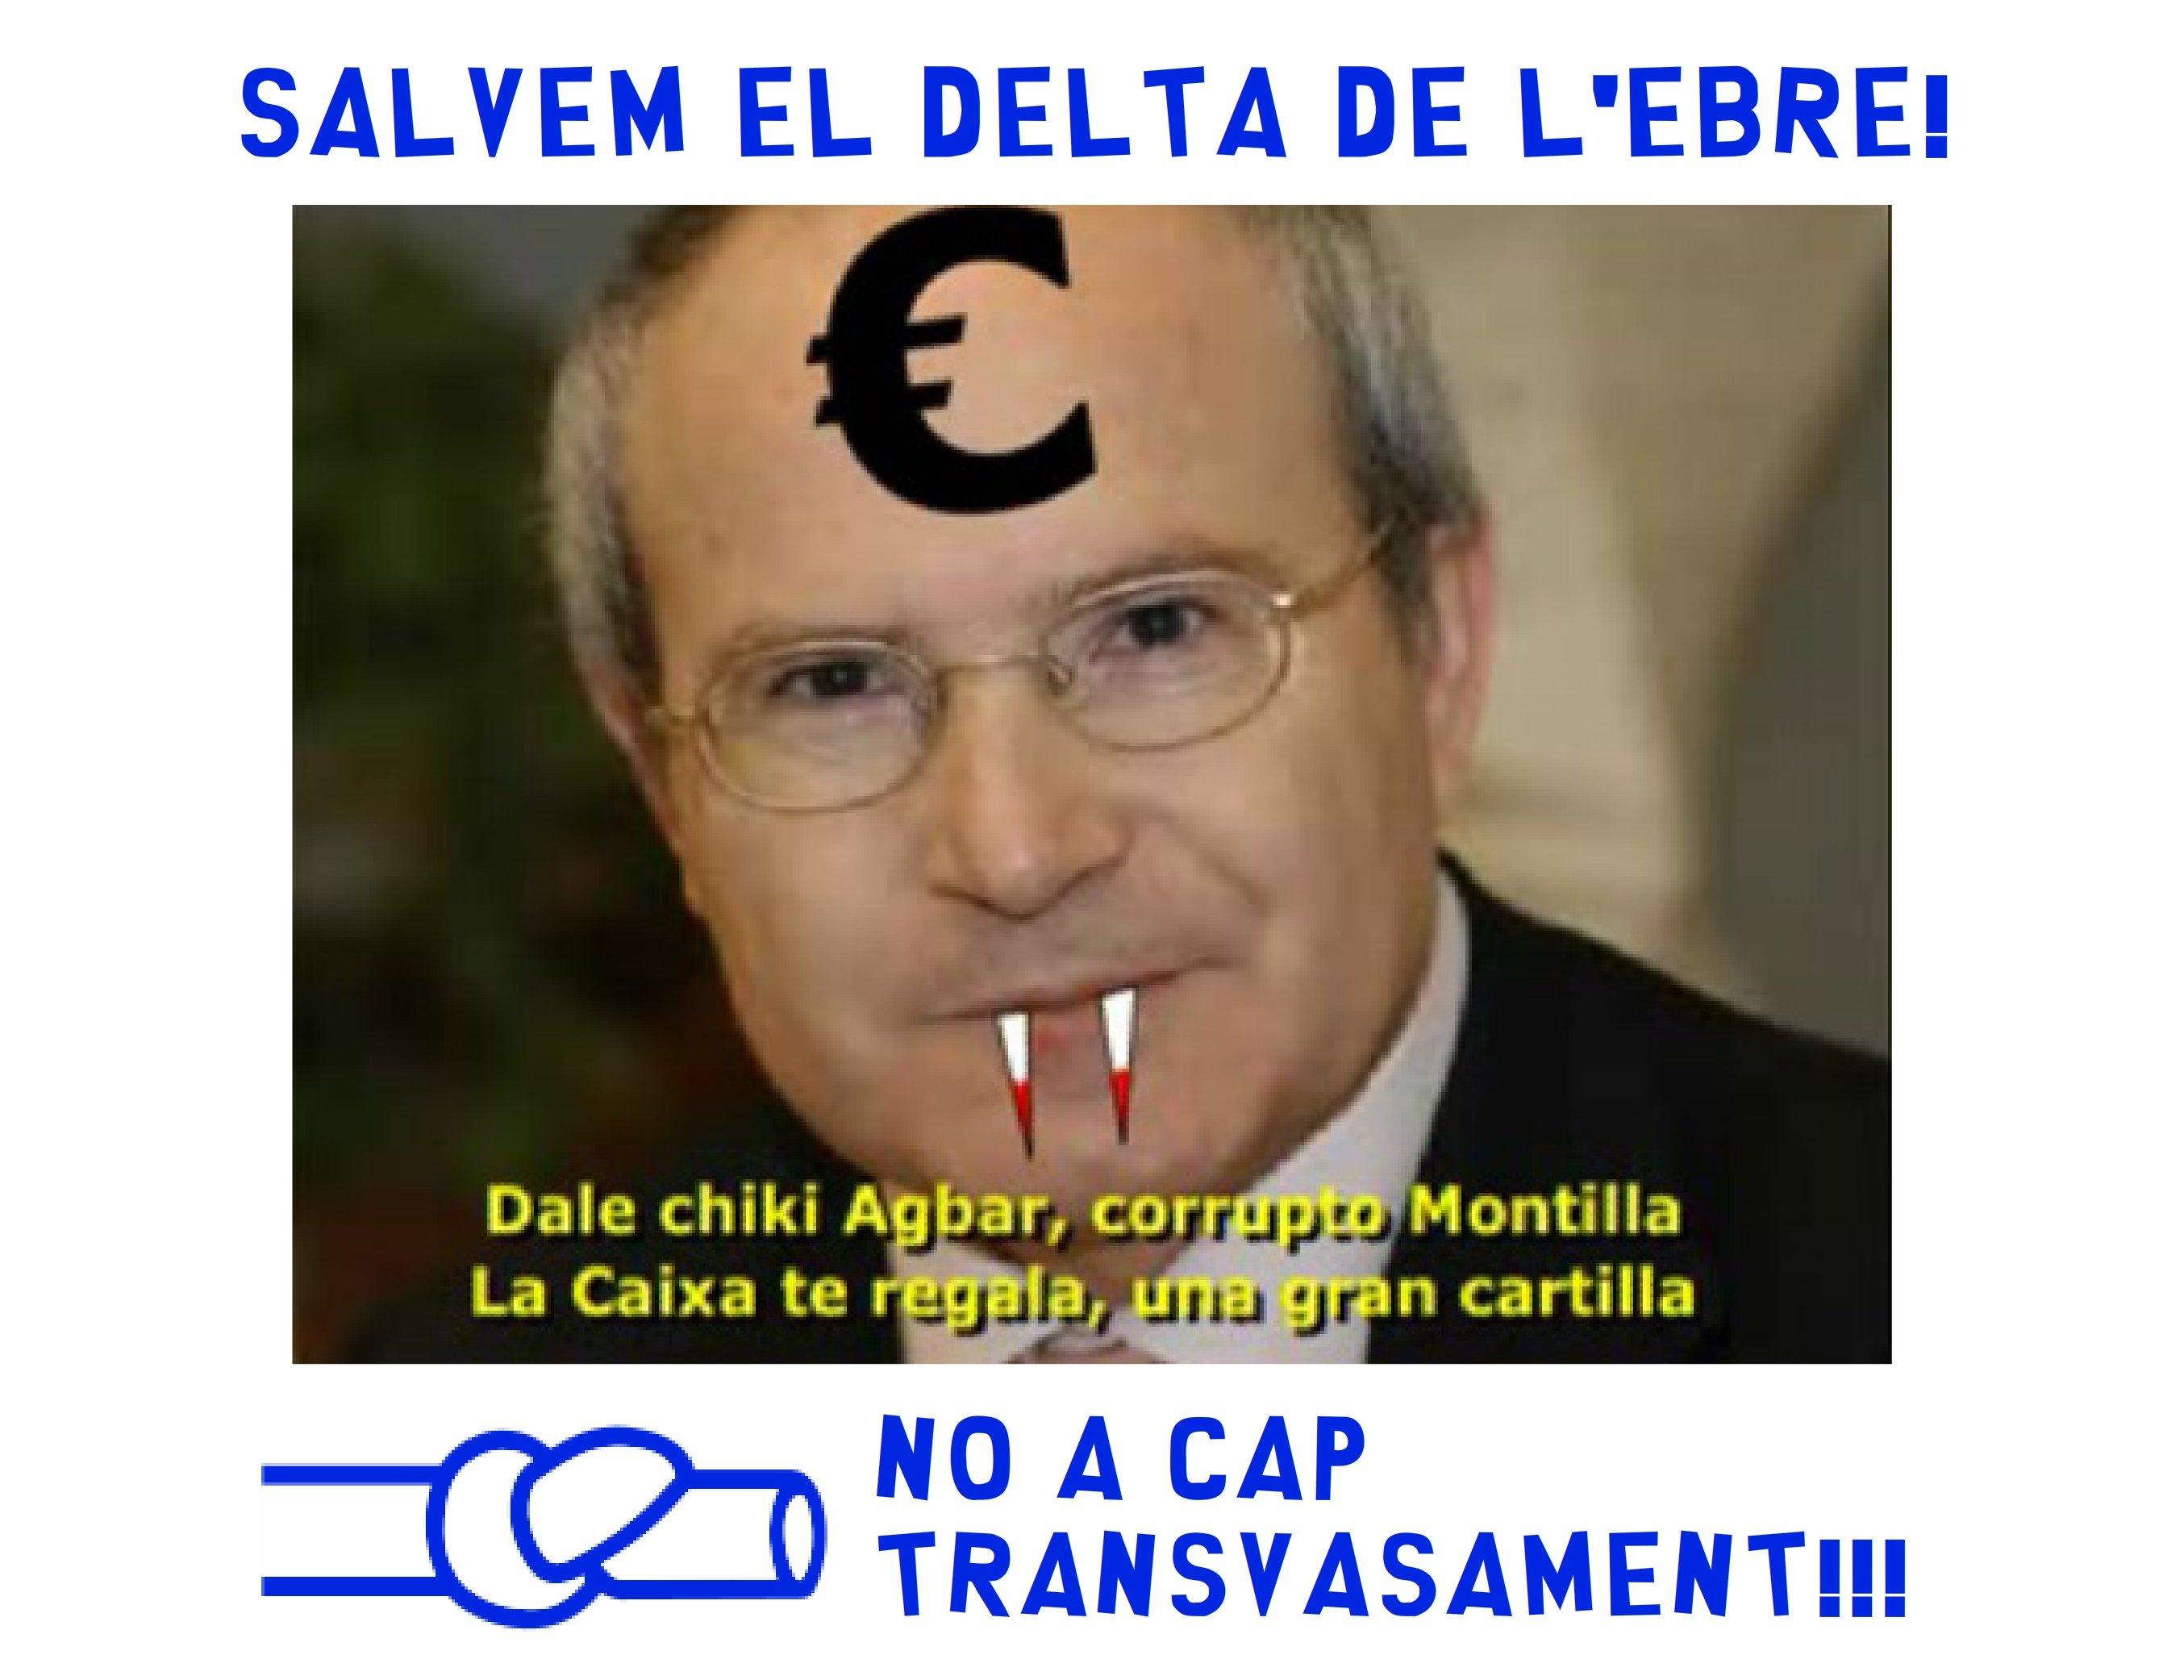 Montilla, PSC, PSOE, Pegatina MINI anti trasvase del Ebro